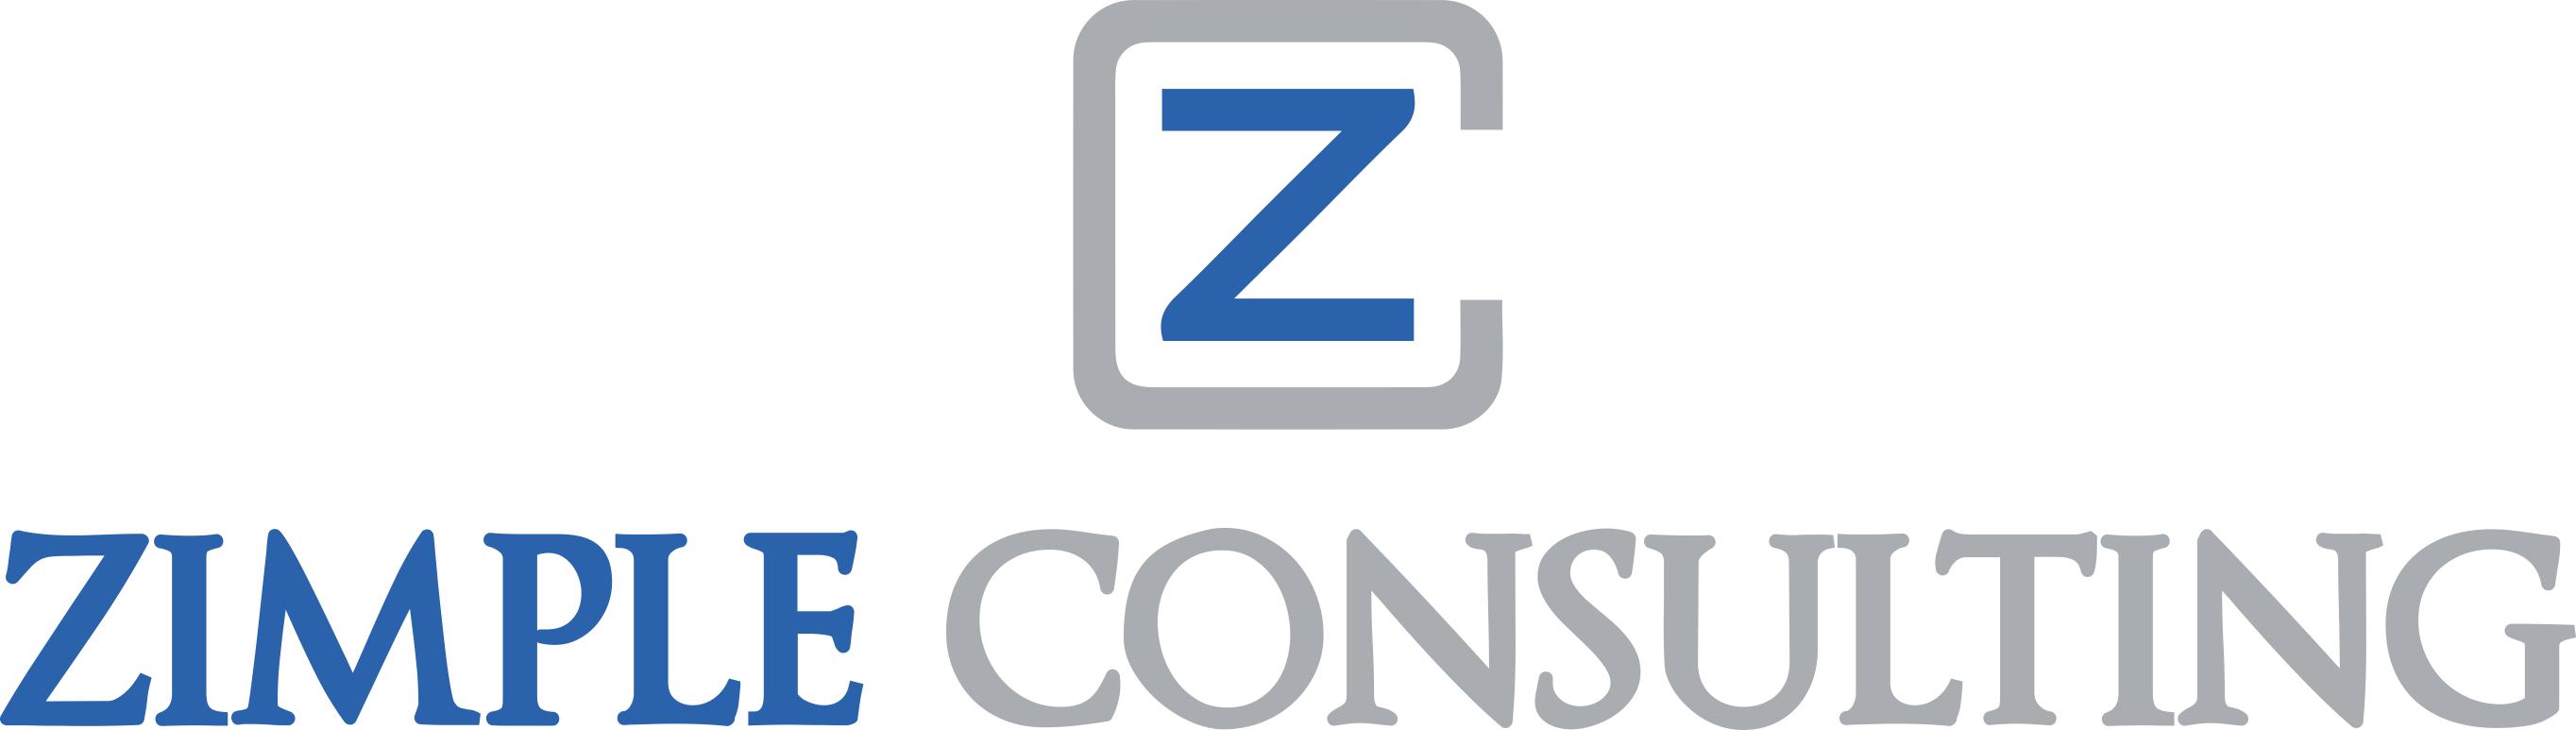 Empresas Desafio10x: Zimple Consulting